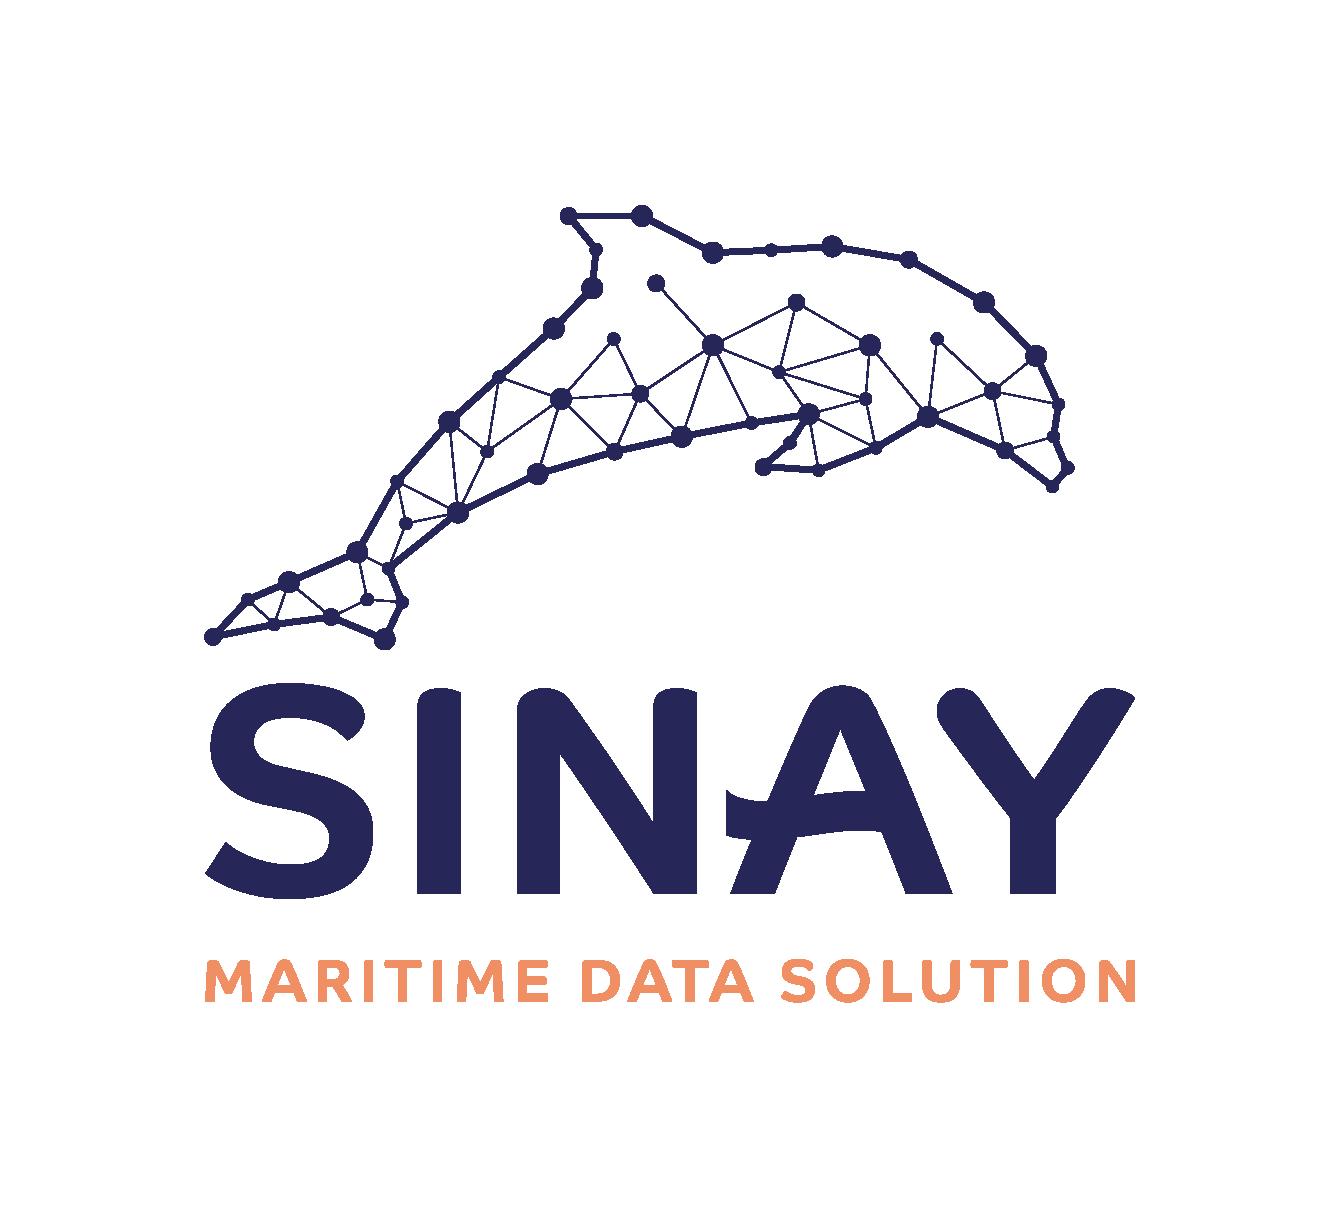 SINAY Maritime Data Platform